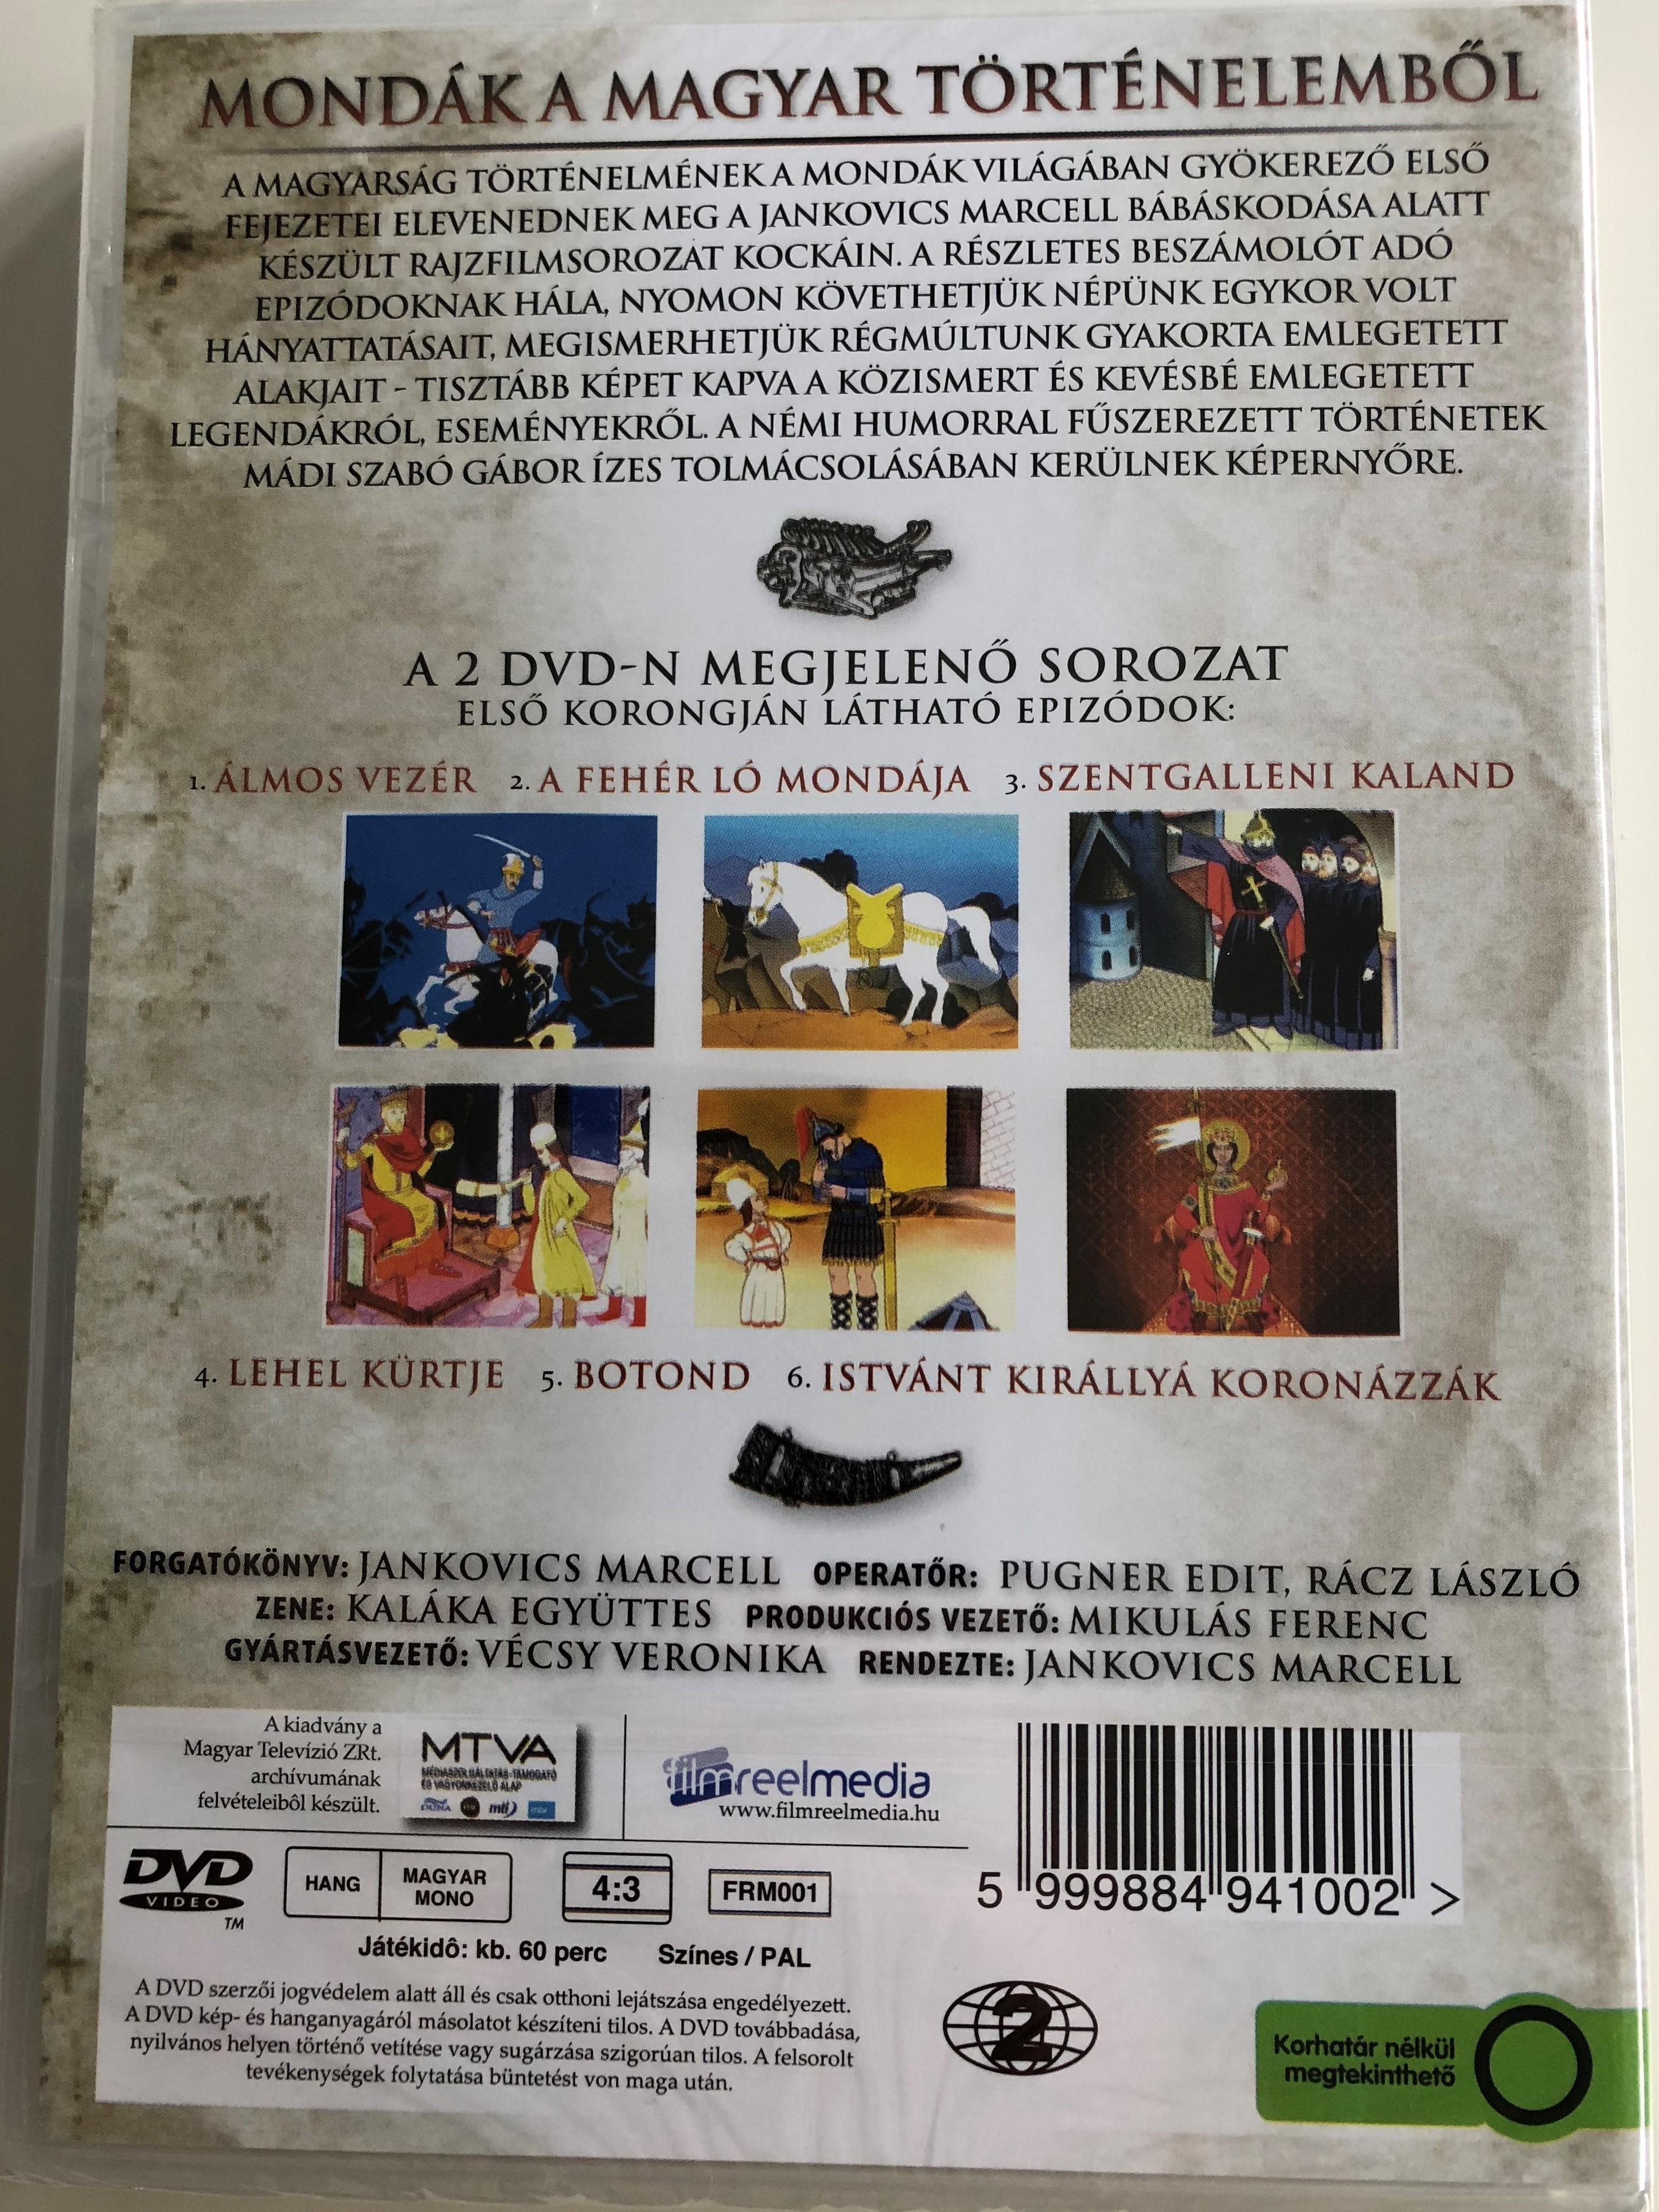 mond-k-a-magyar-t-rt-nelemb-l-1.-dvd-2011-2.jpg